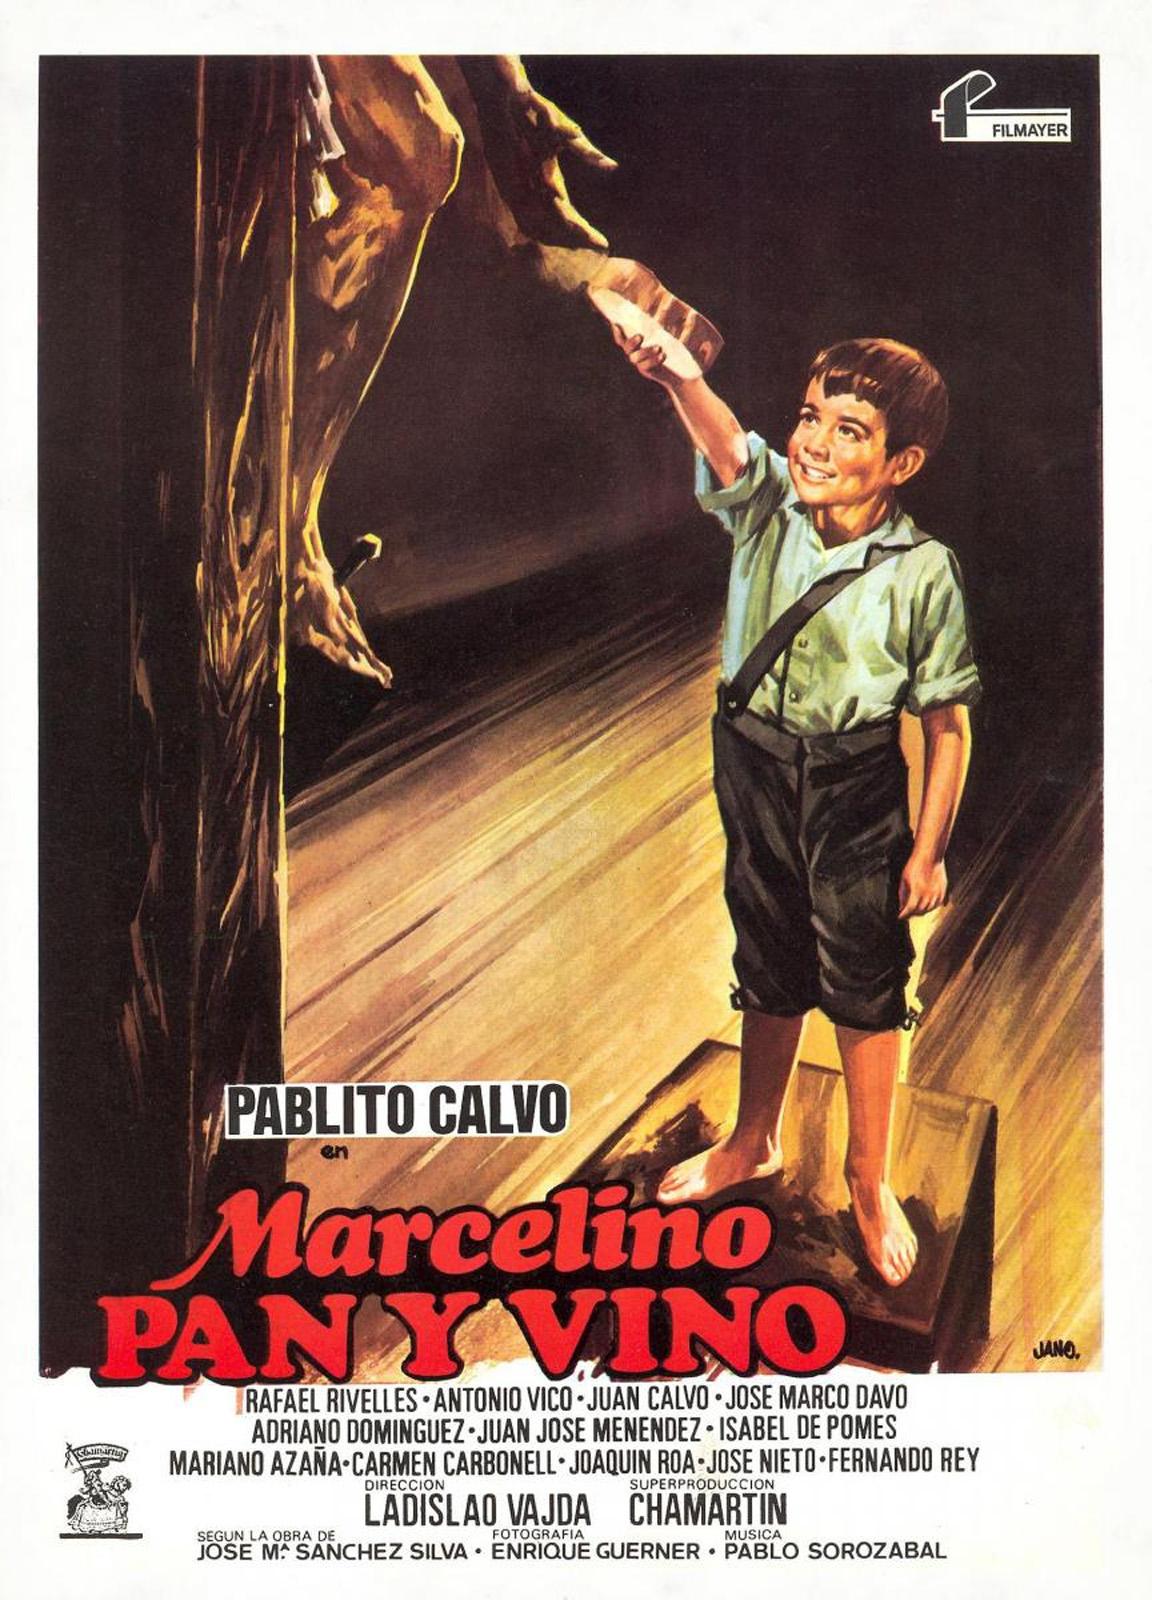 Marcelino Espanhol